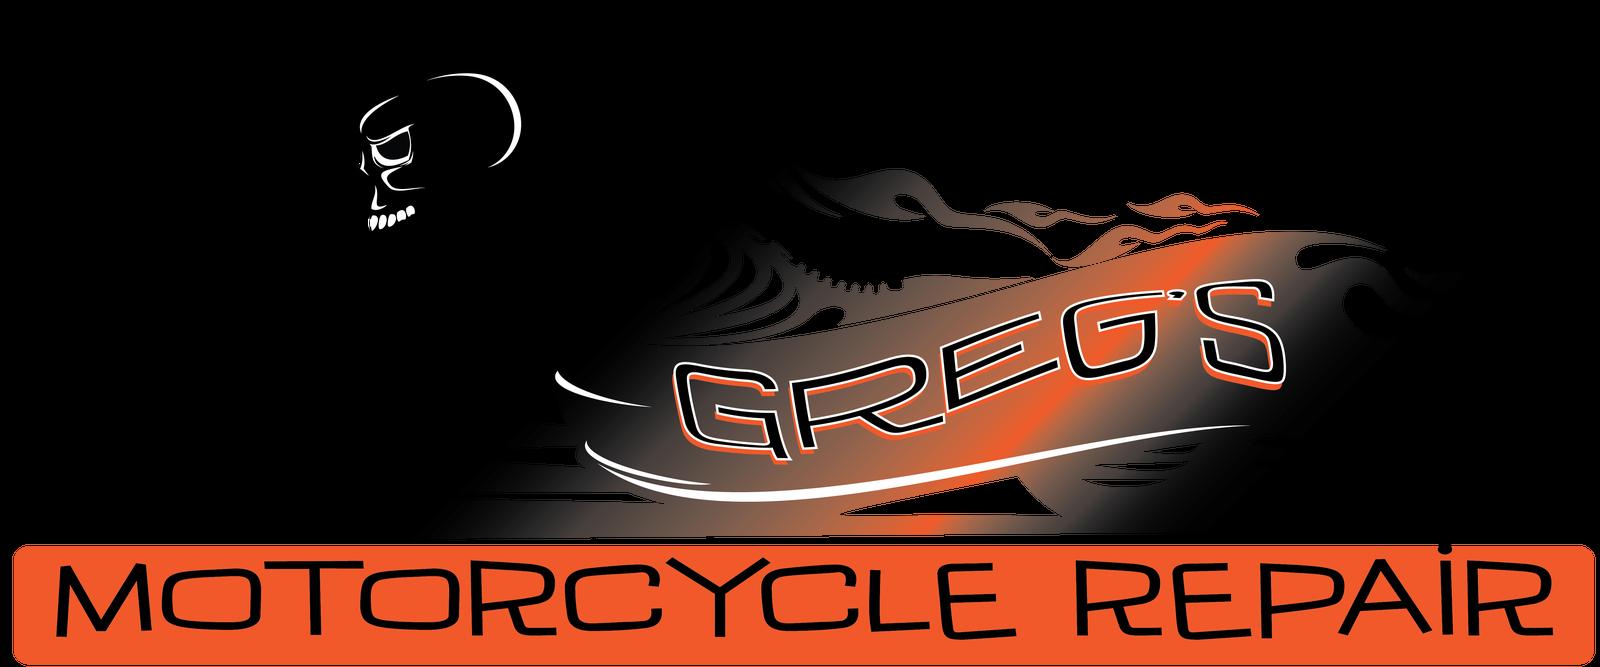 Greg's Motorcycle Repair inc.